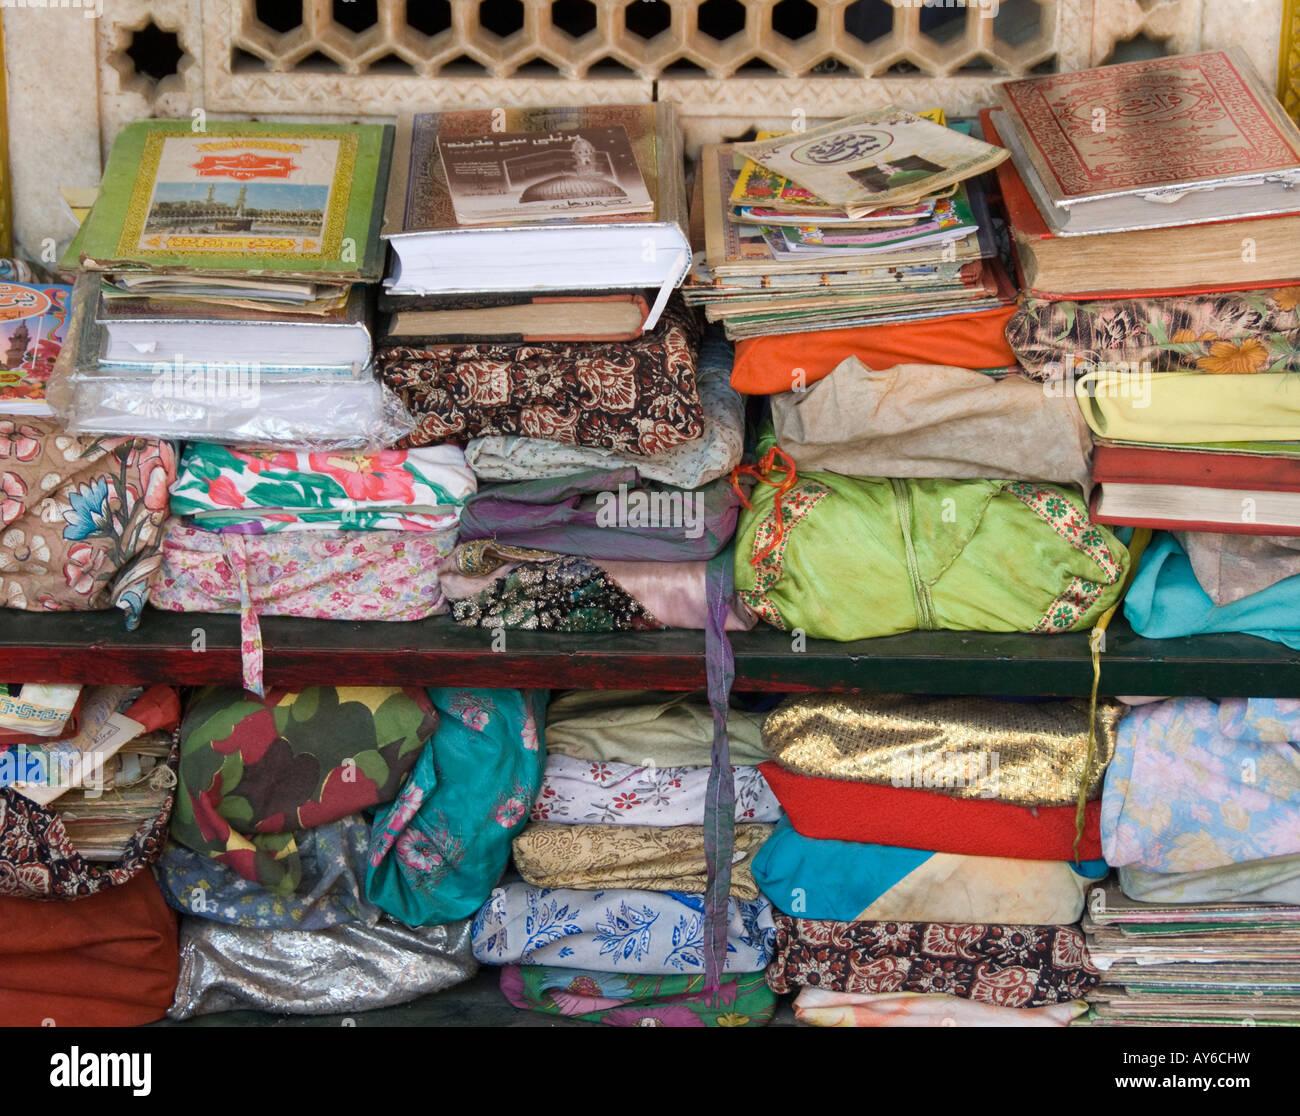 Copies of the Koran at a mosque - Stock Image